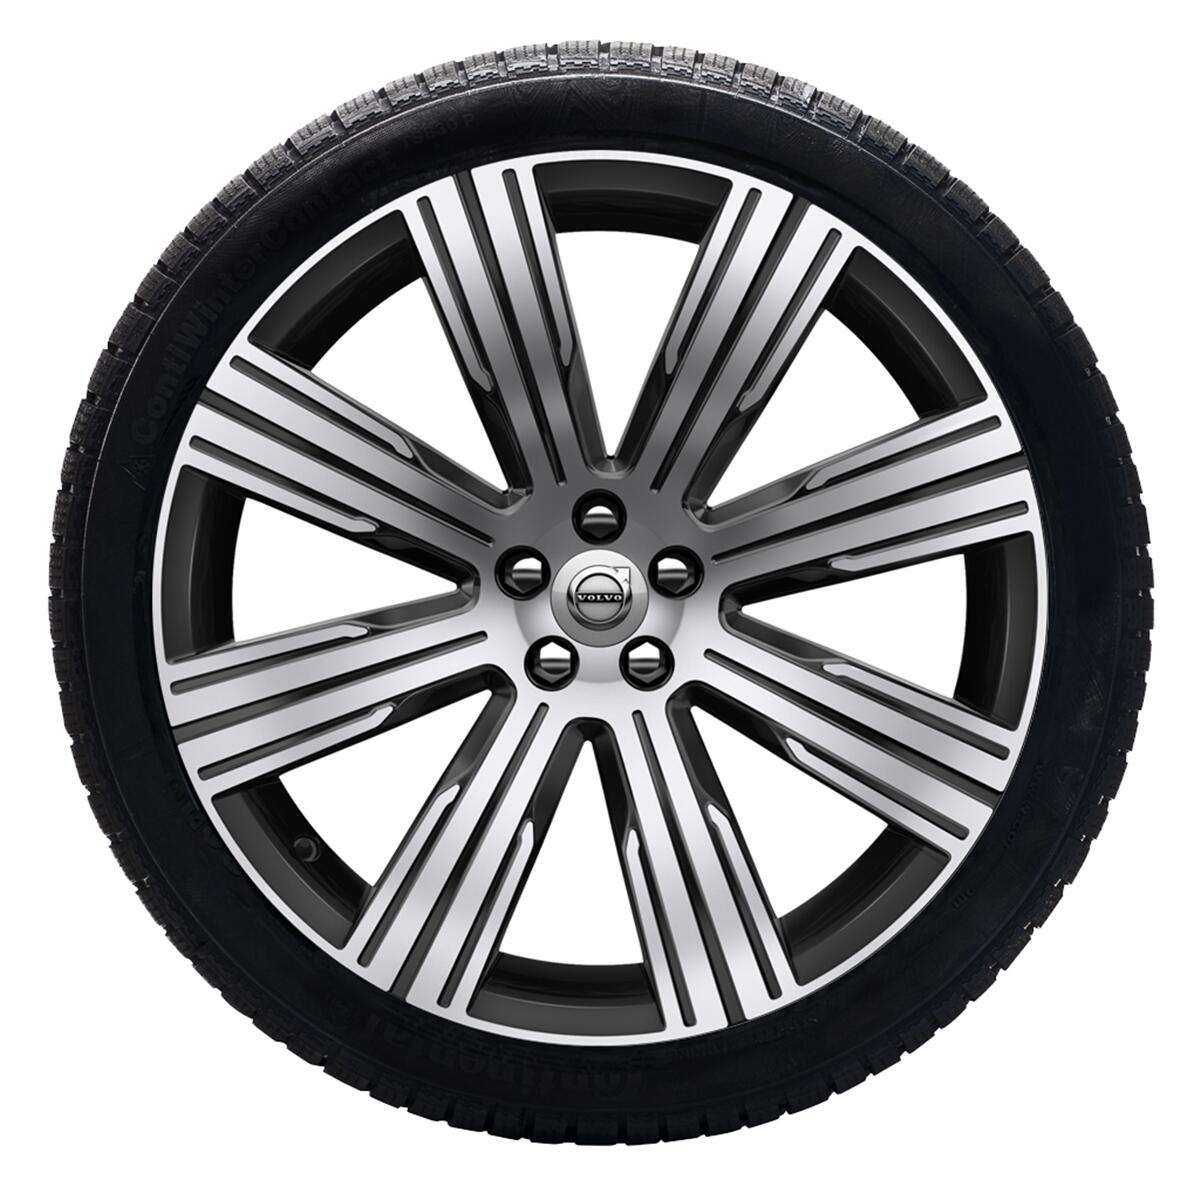 "Komplet zimskih koles:  53,34cm (21""), pnevmatike Nokian"